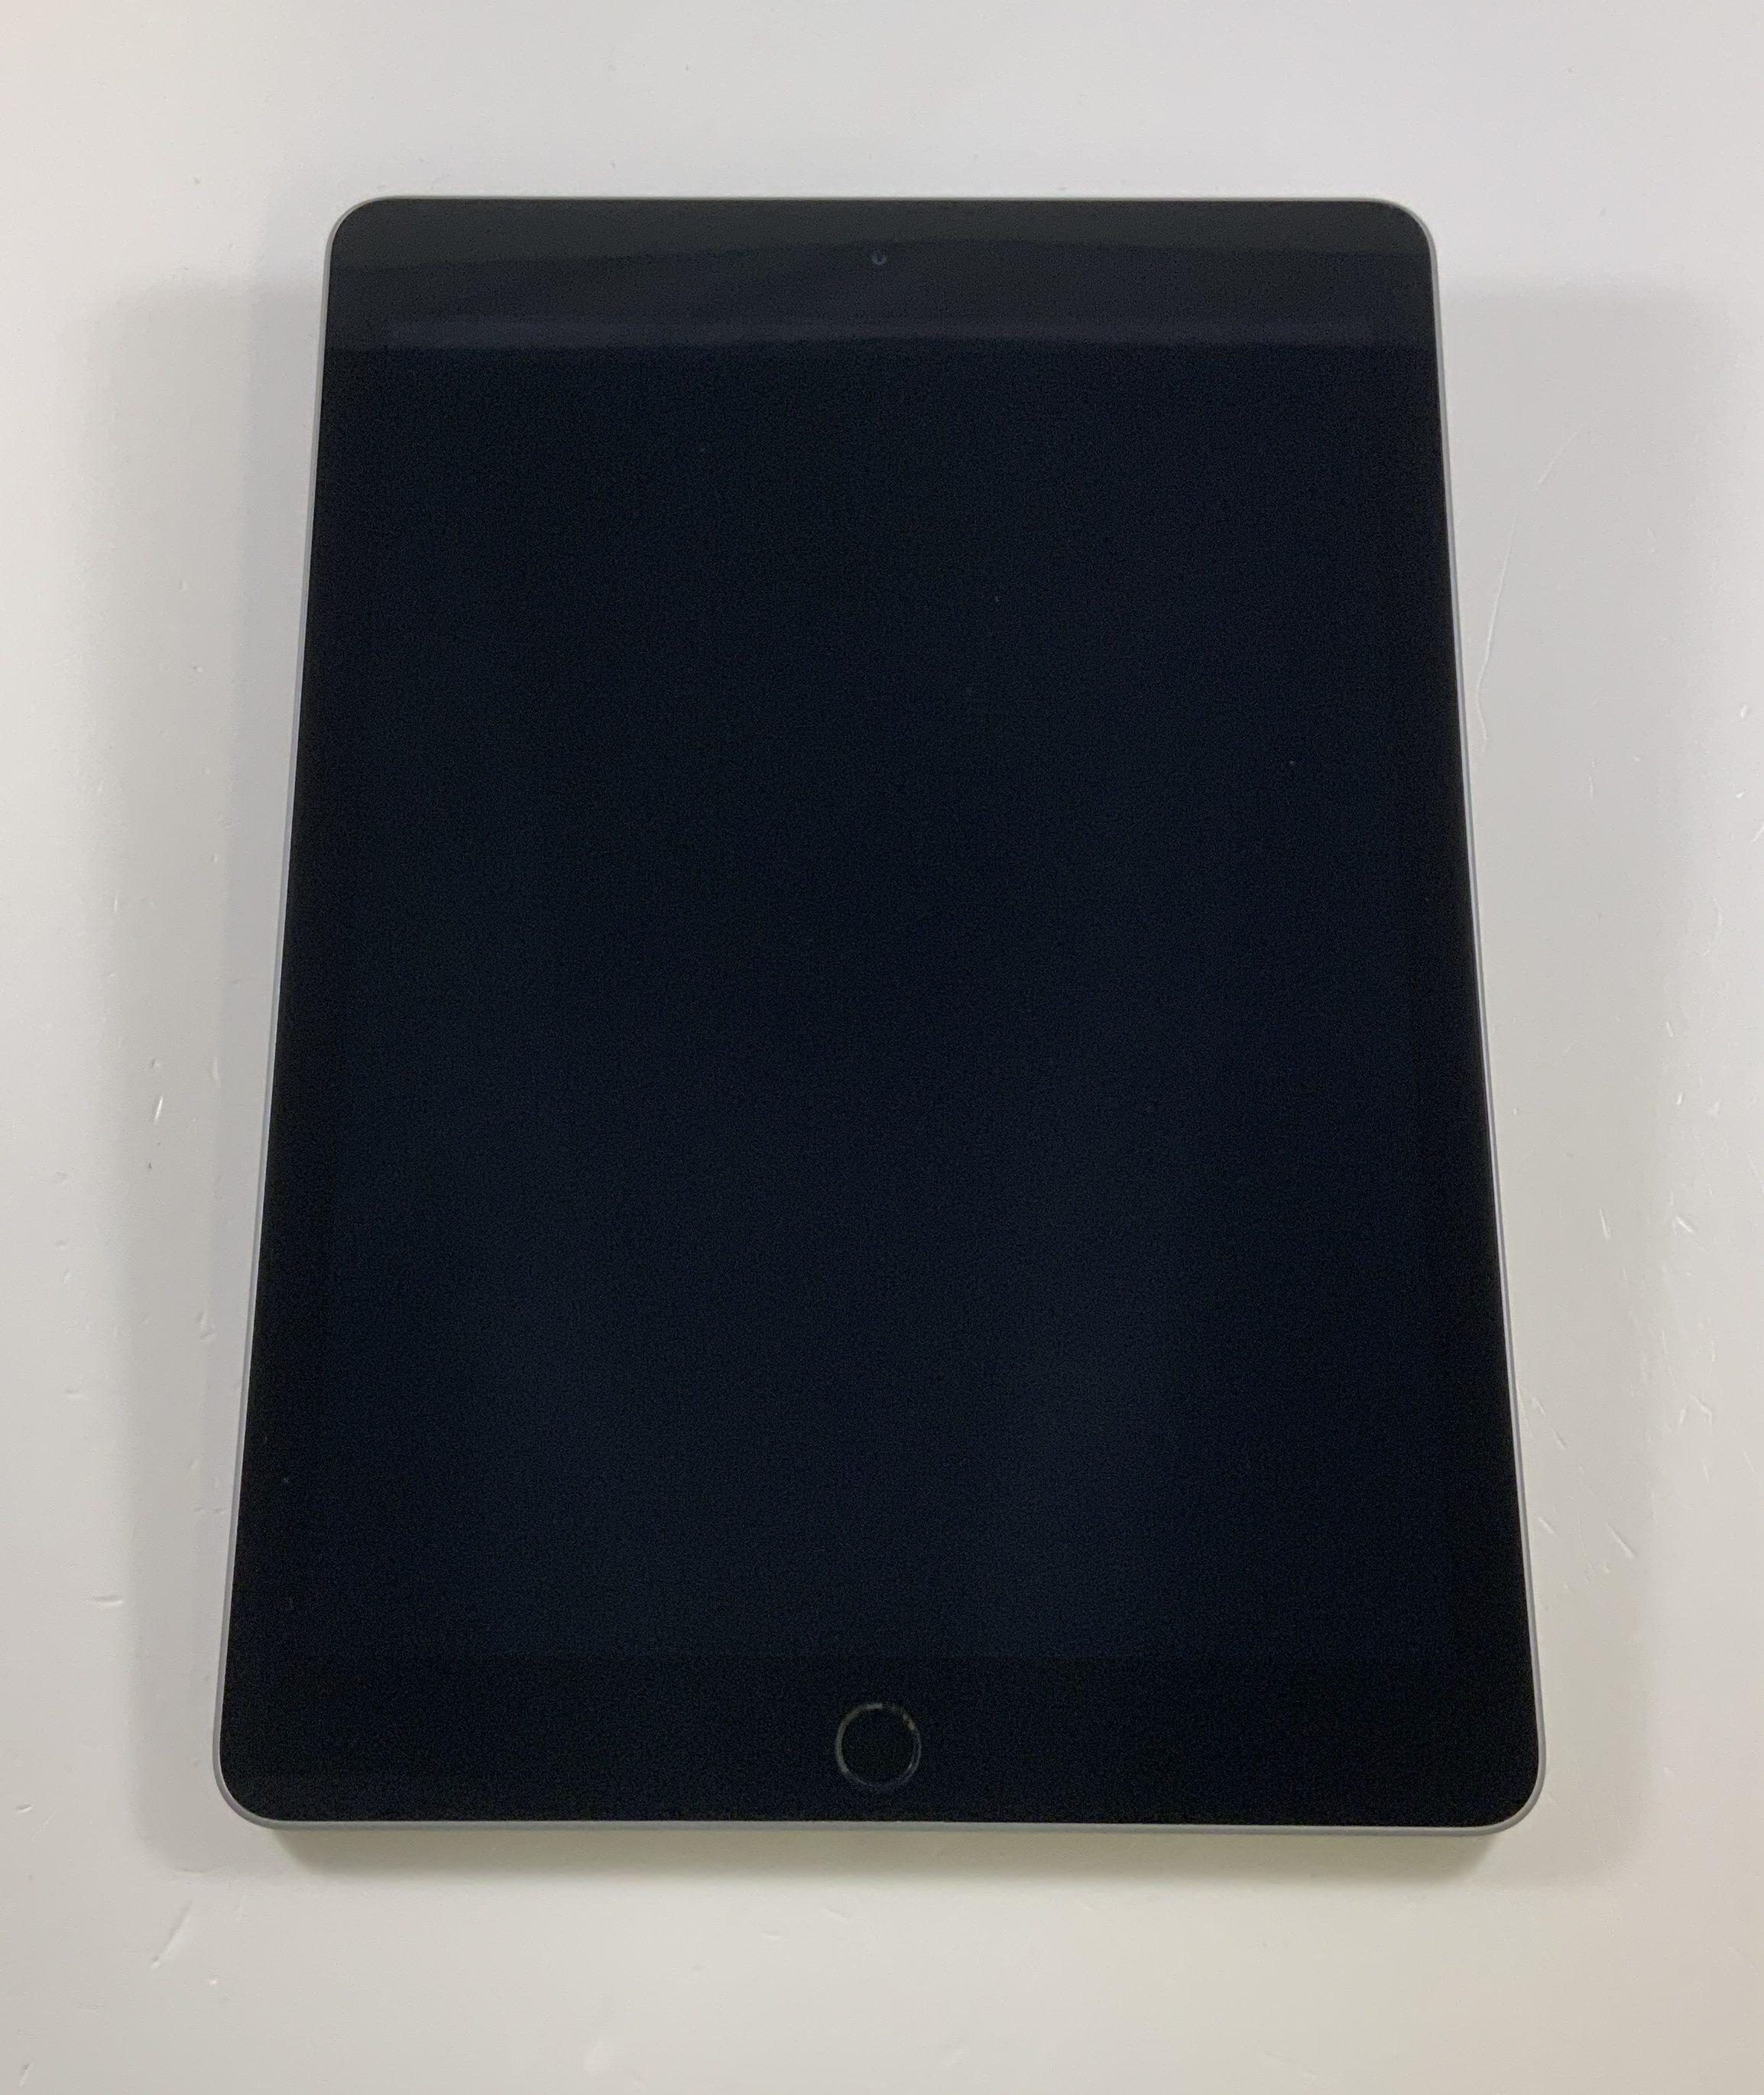 iPad 5 Wi-Fi 32GB, 32GB, Space Gray, Kuva 1